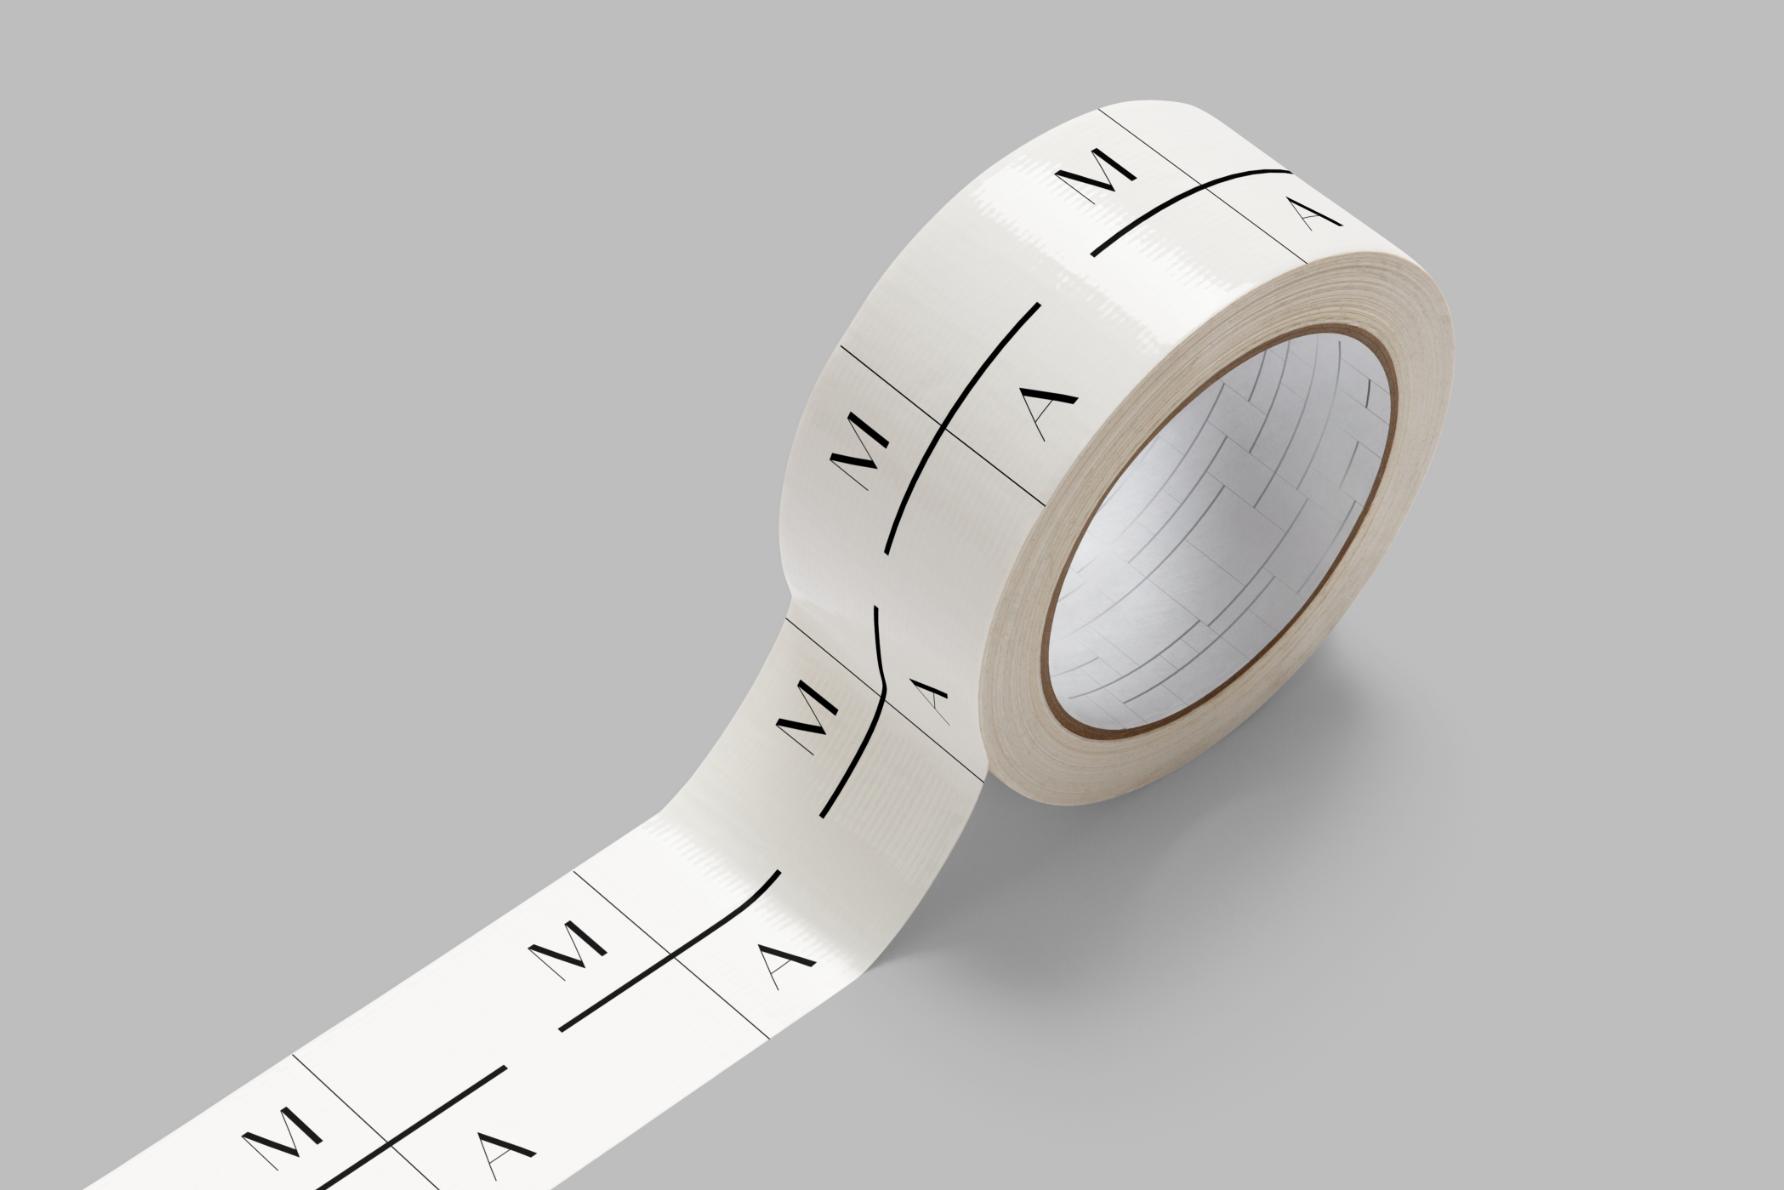 rea-marin-architects-tape